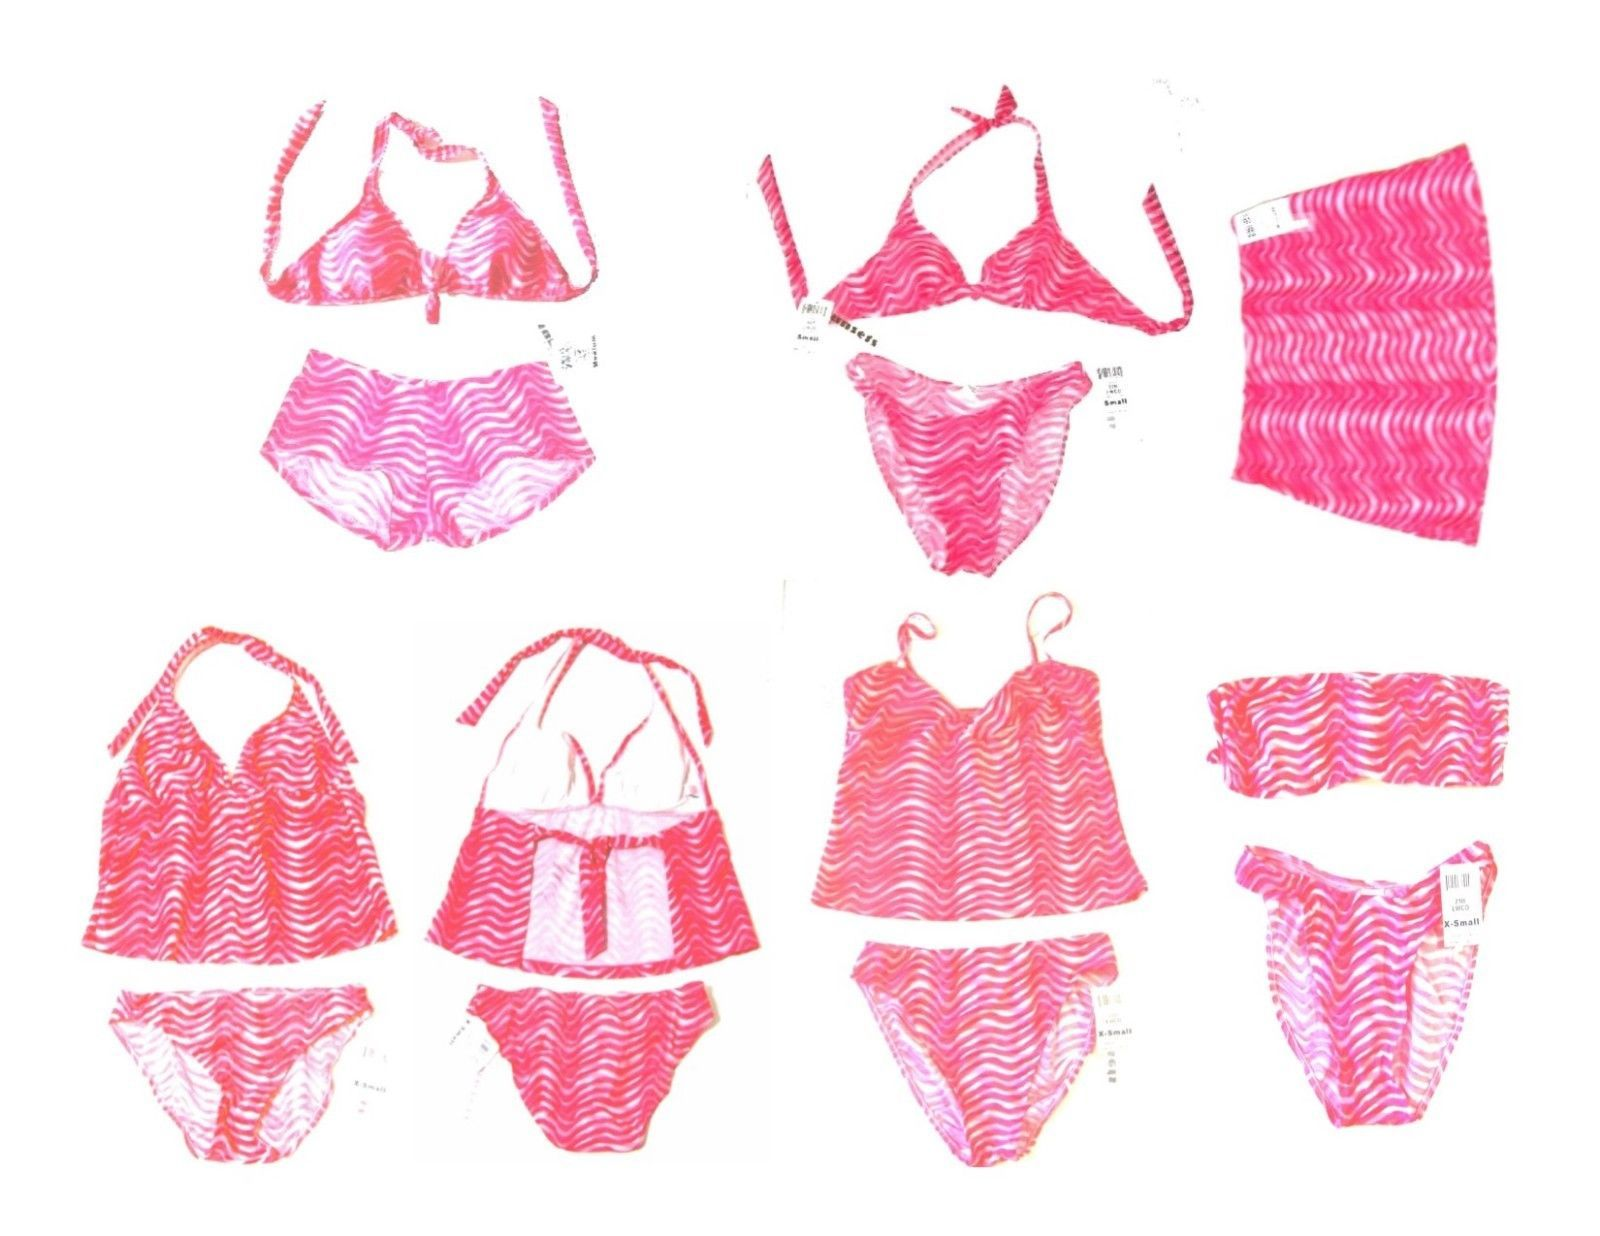 Sunsets Liquid Wave Bikini and Tankini Swimsuits & Separates NWT$50+ - $27.07 - $40.61